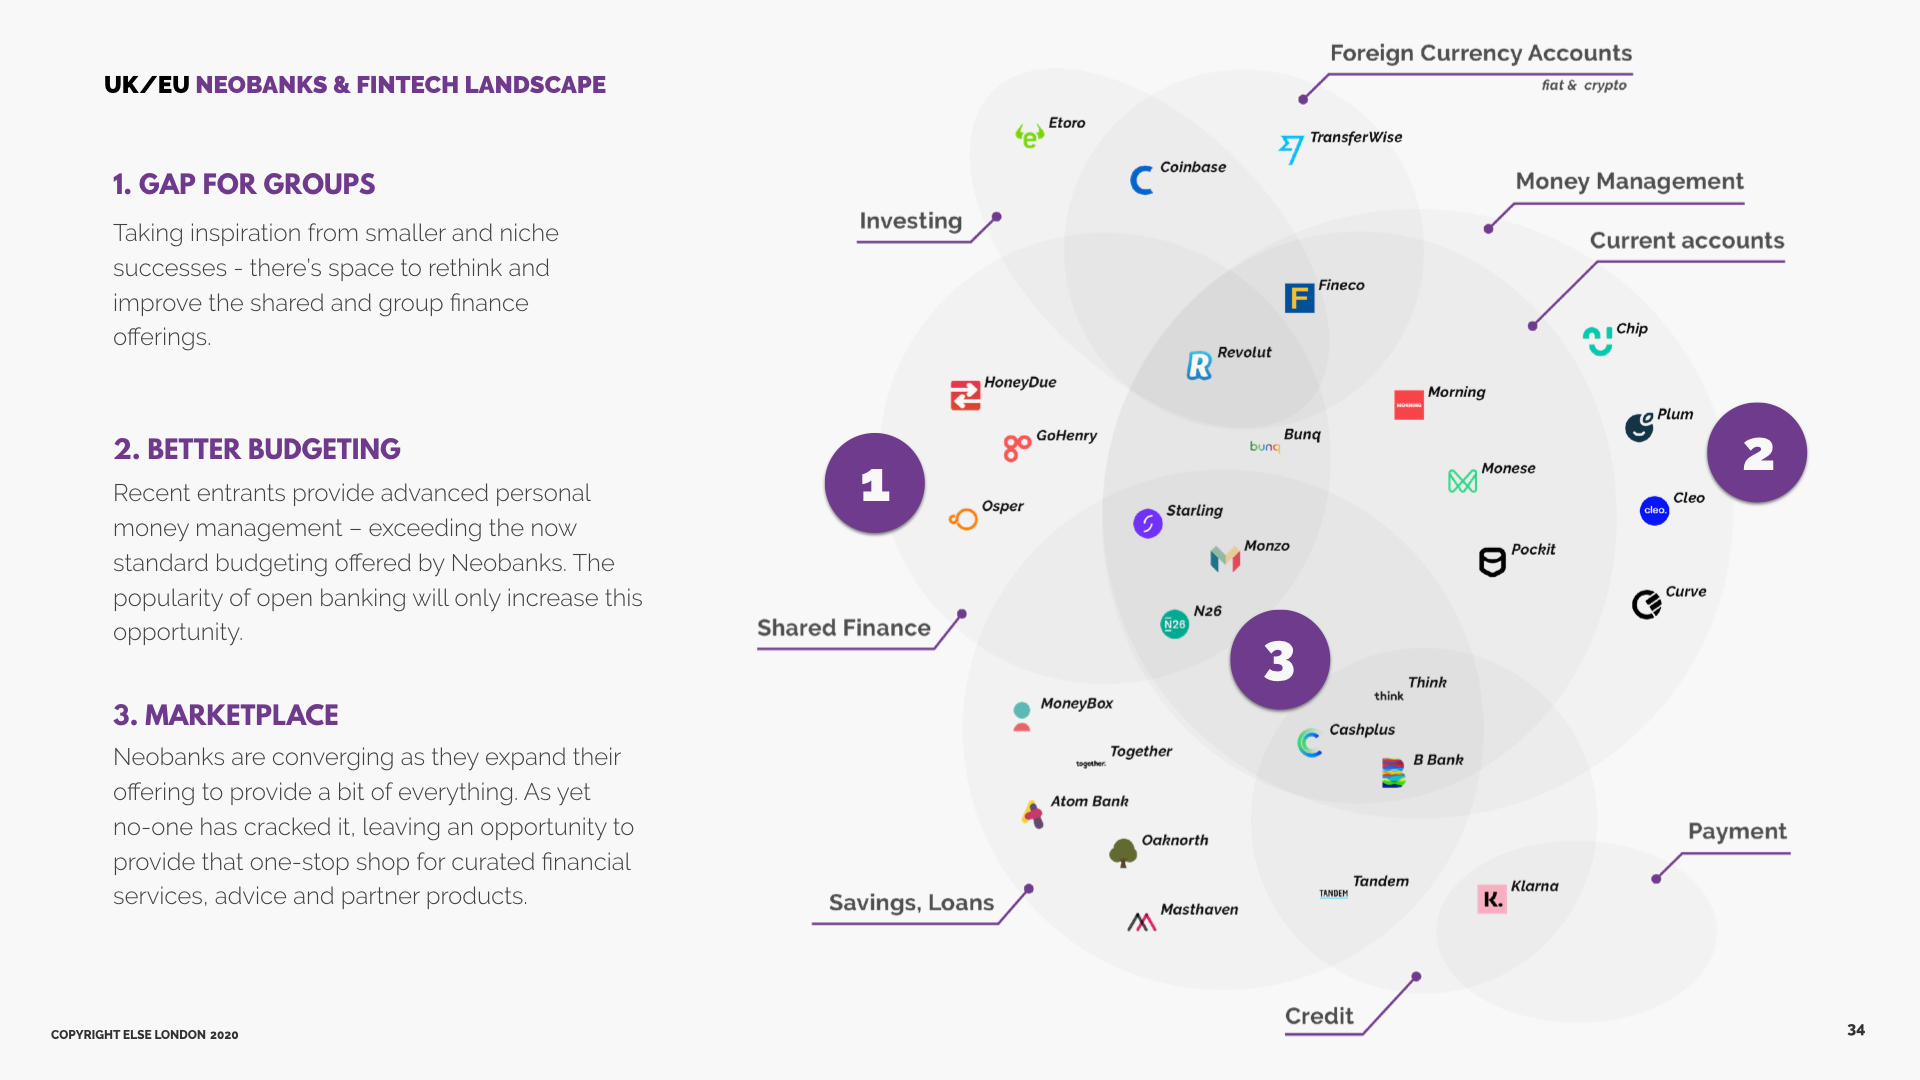 UK neo banks and fintech innovation landscape